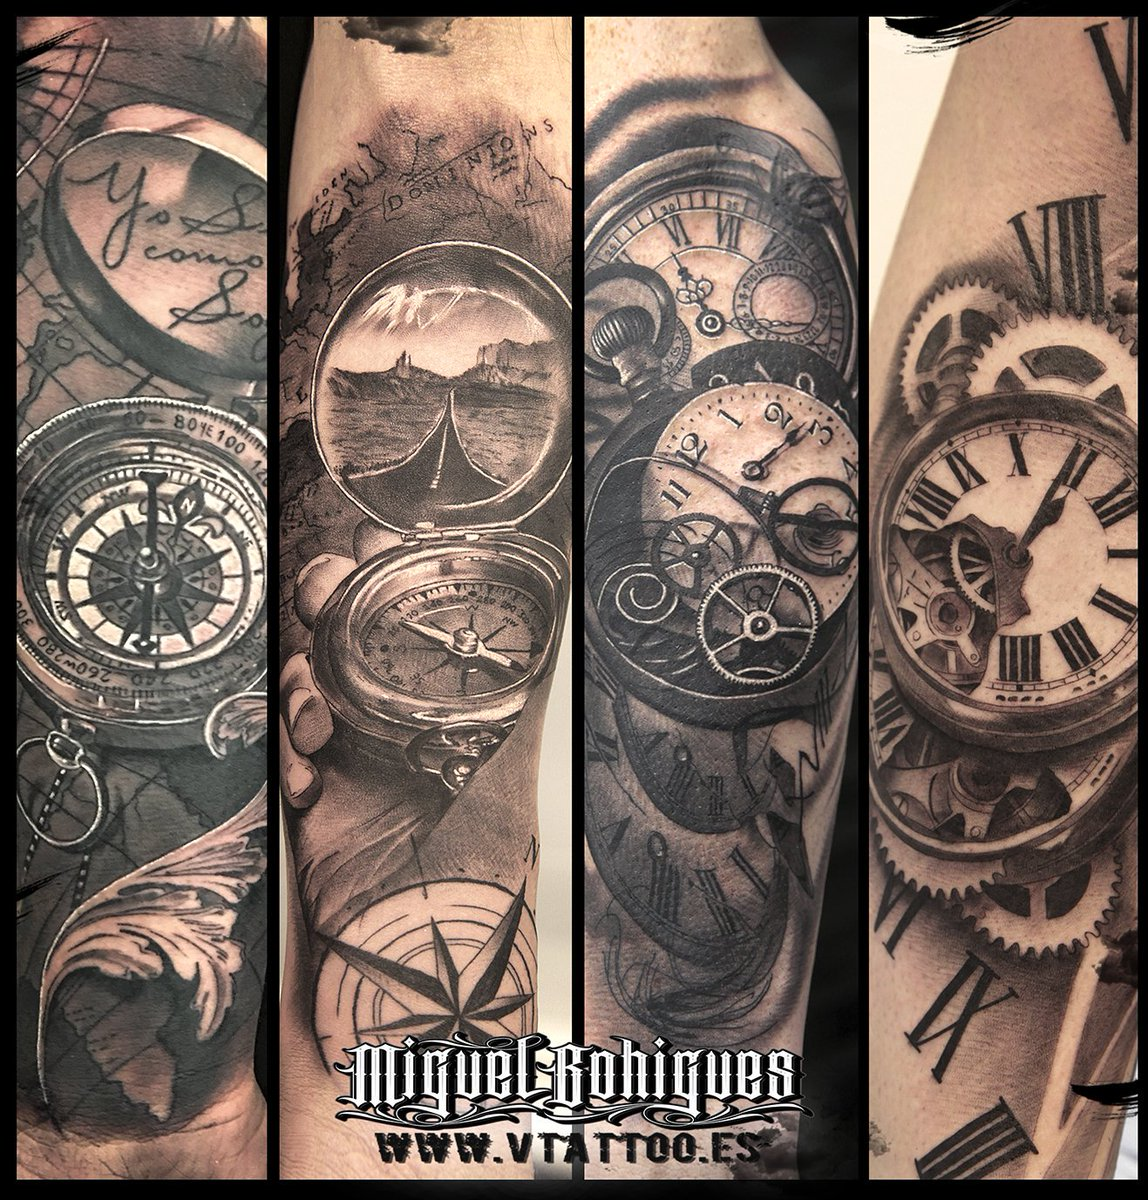 V Tattoo Spain On Twitter Hay Quienes Estropean Relojes Para